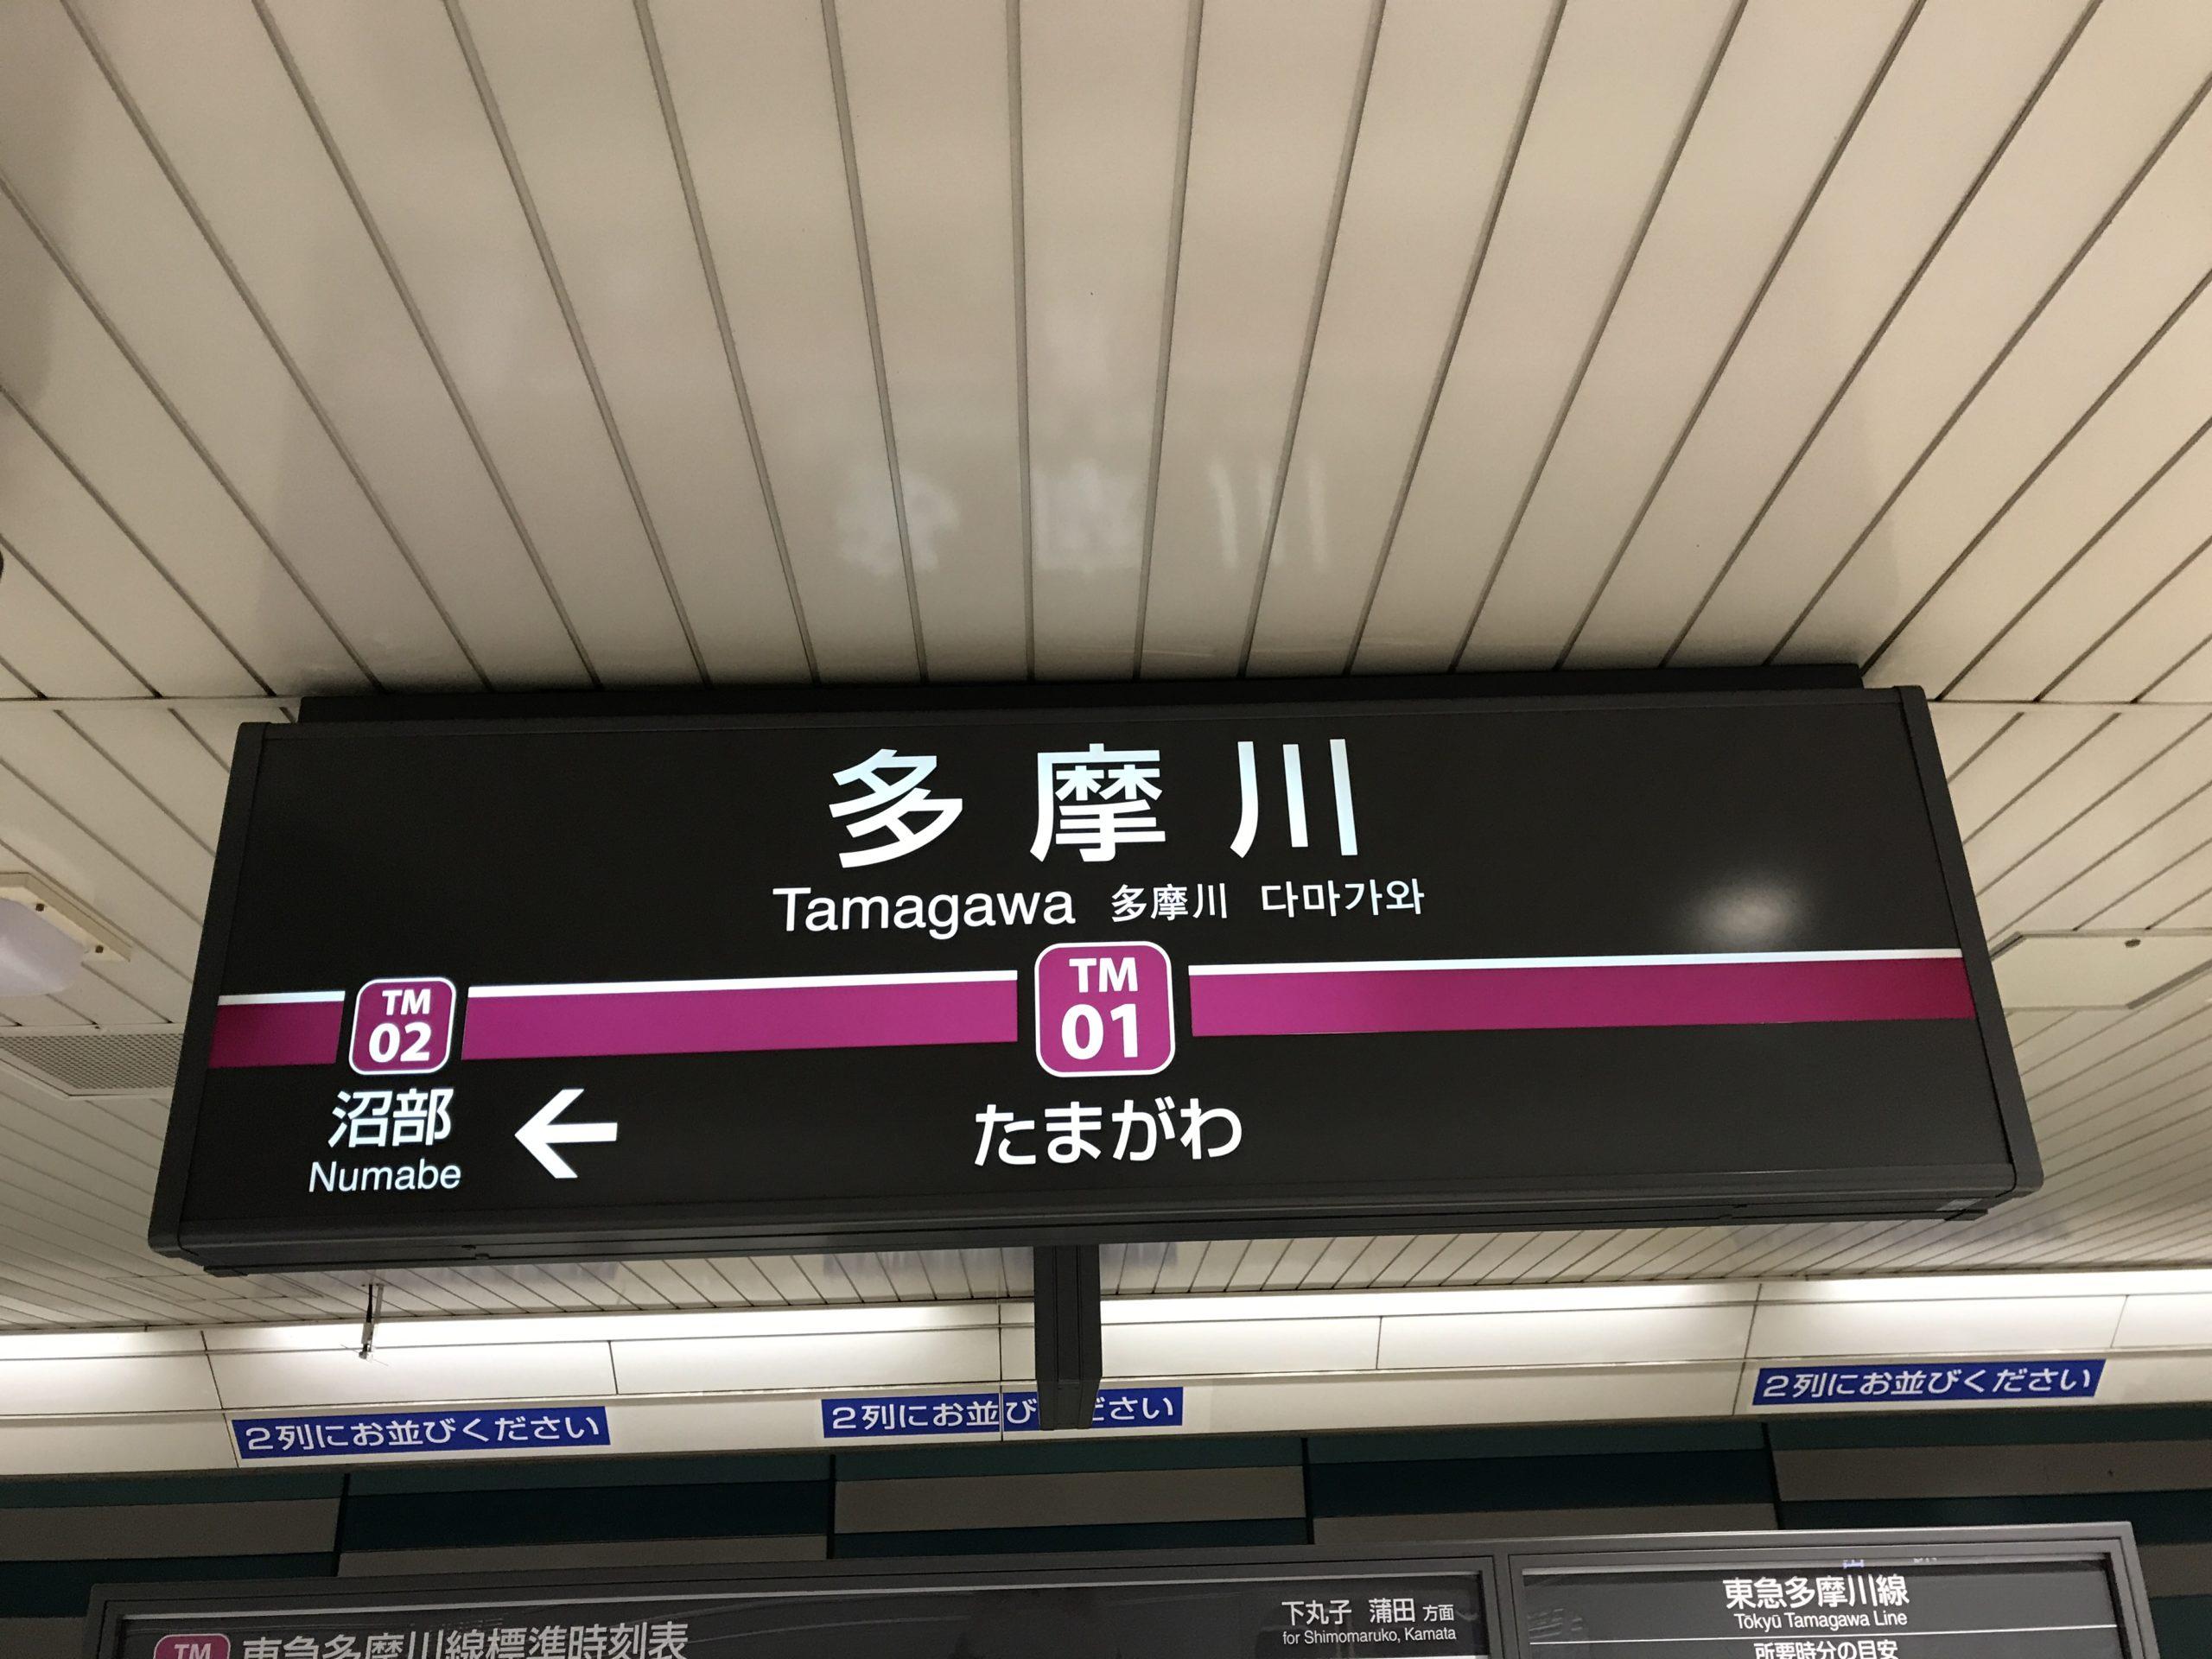 TM01_多摩川駅ホーム看板